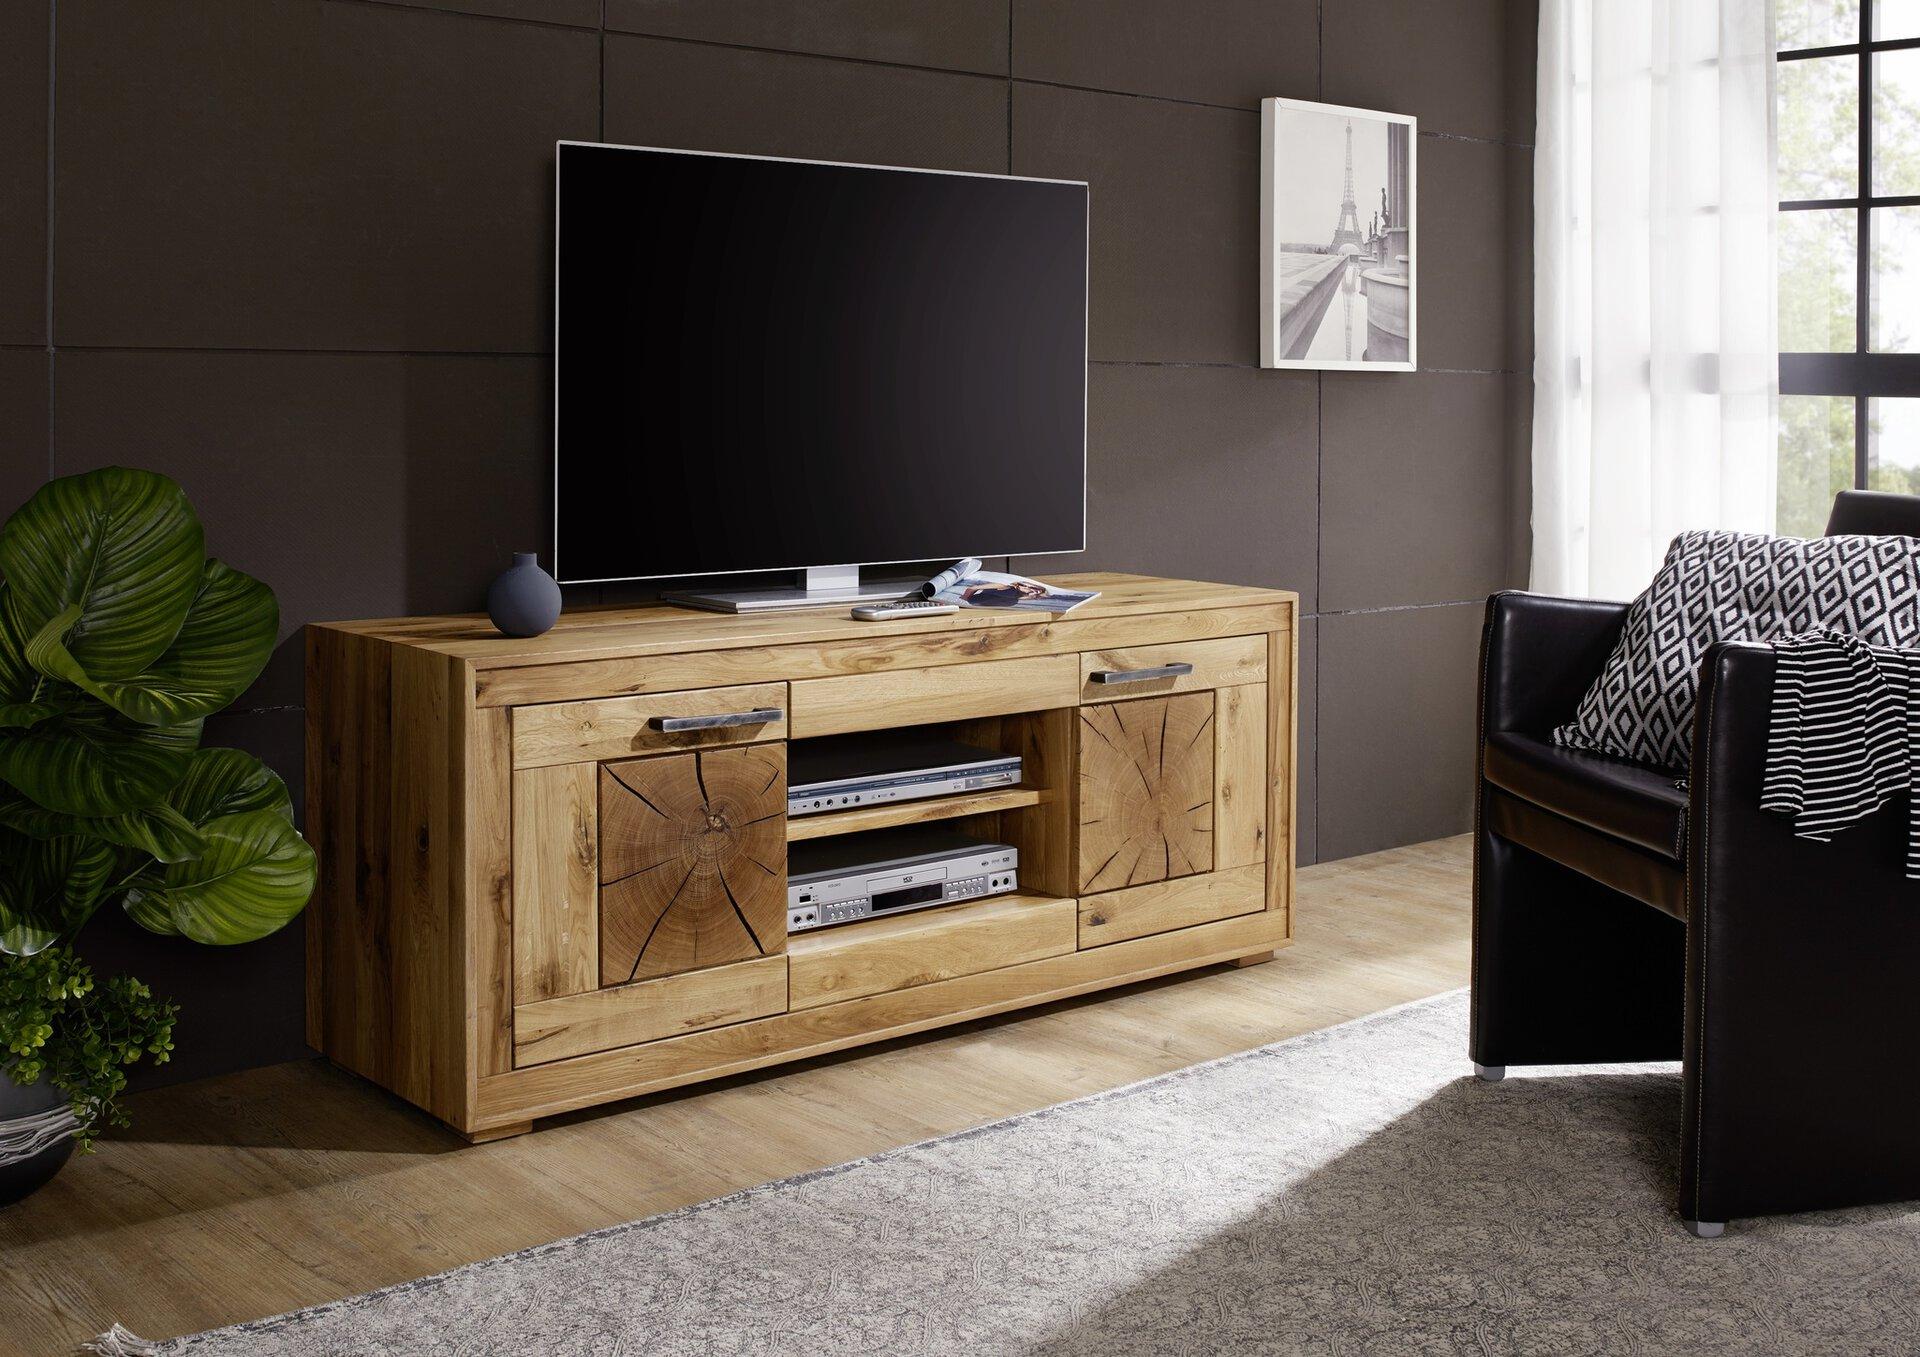 TV-Board WZ-0315 CELECT Holz mehrfarbig 46 x 62 x 150 cm